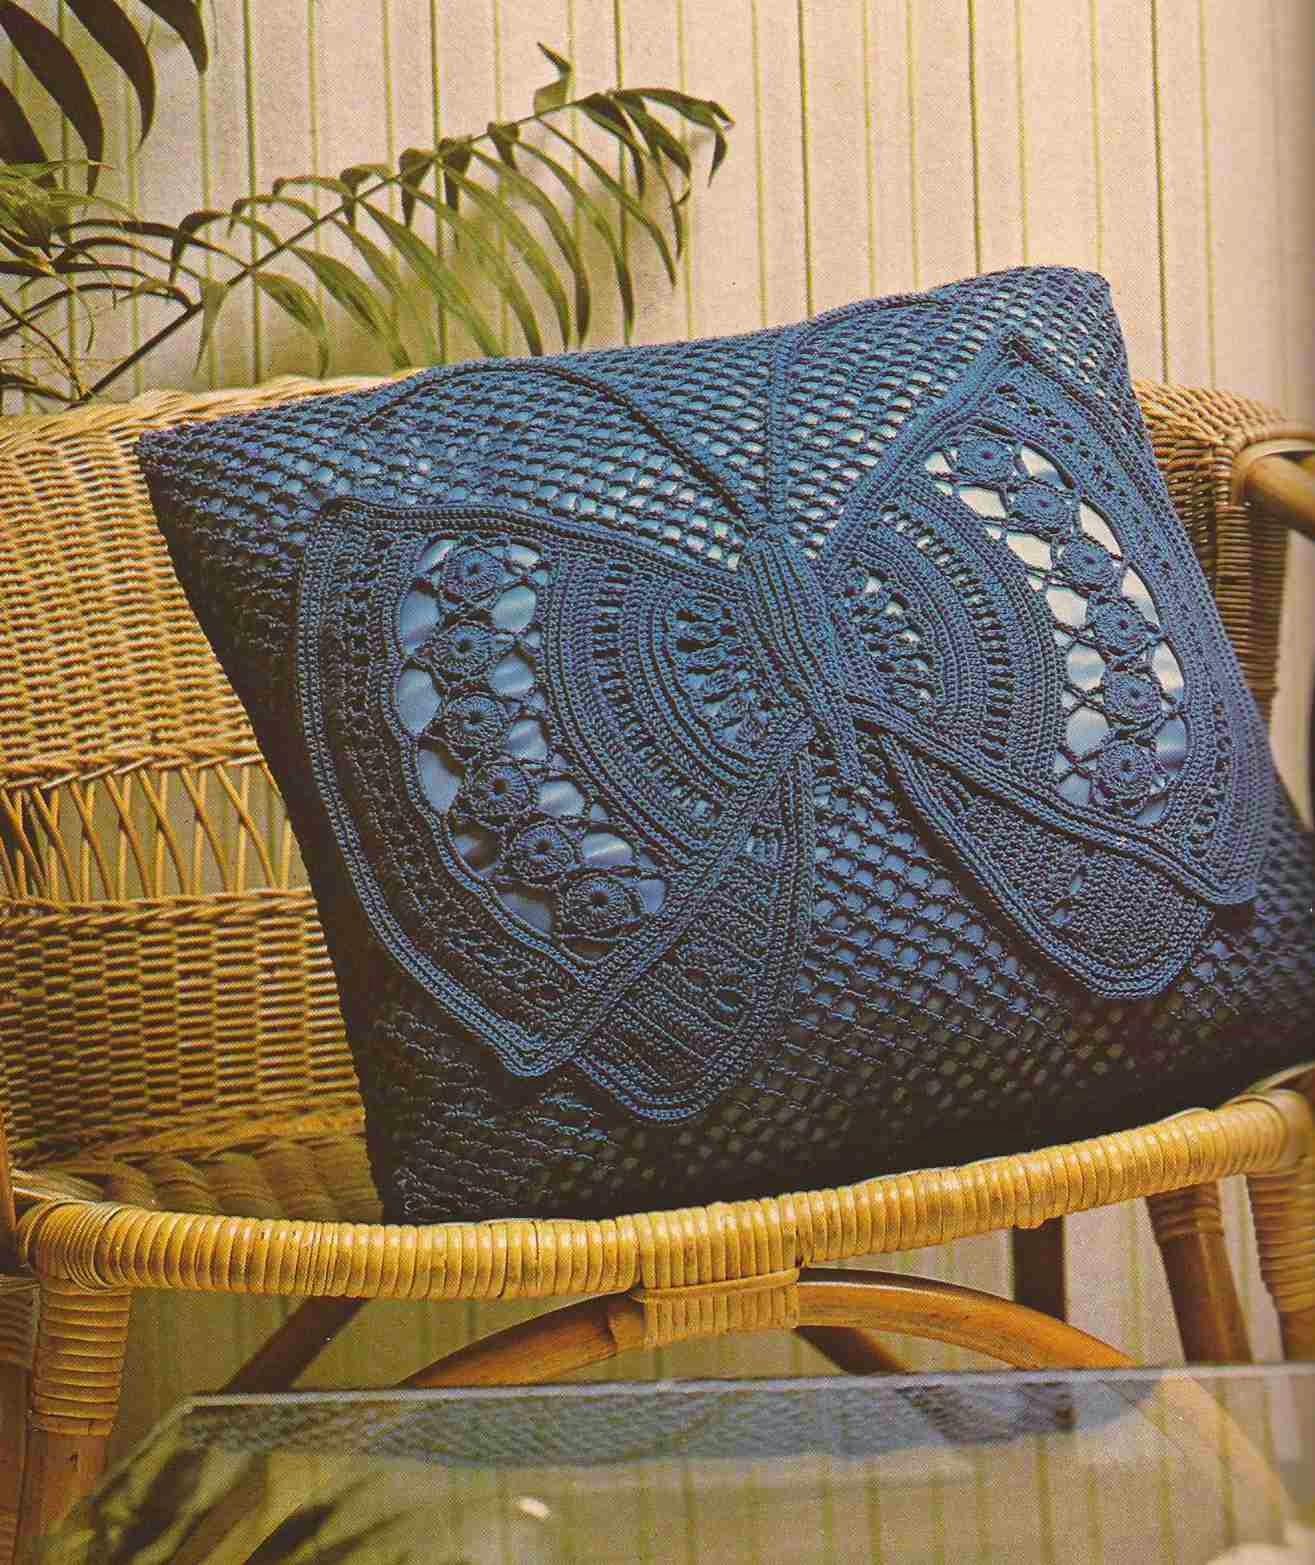 Cojín a Crochet Mariposa (Con las Alas Desplegadas)